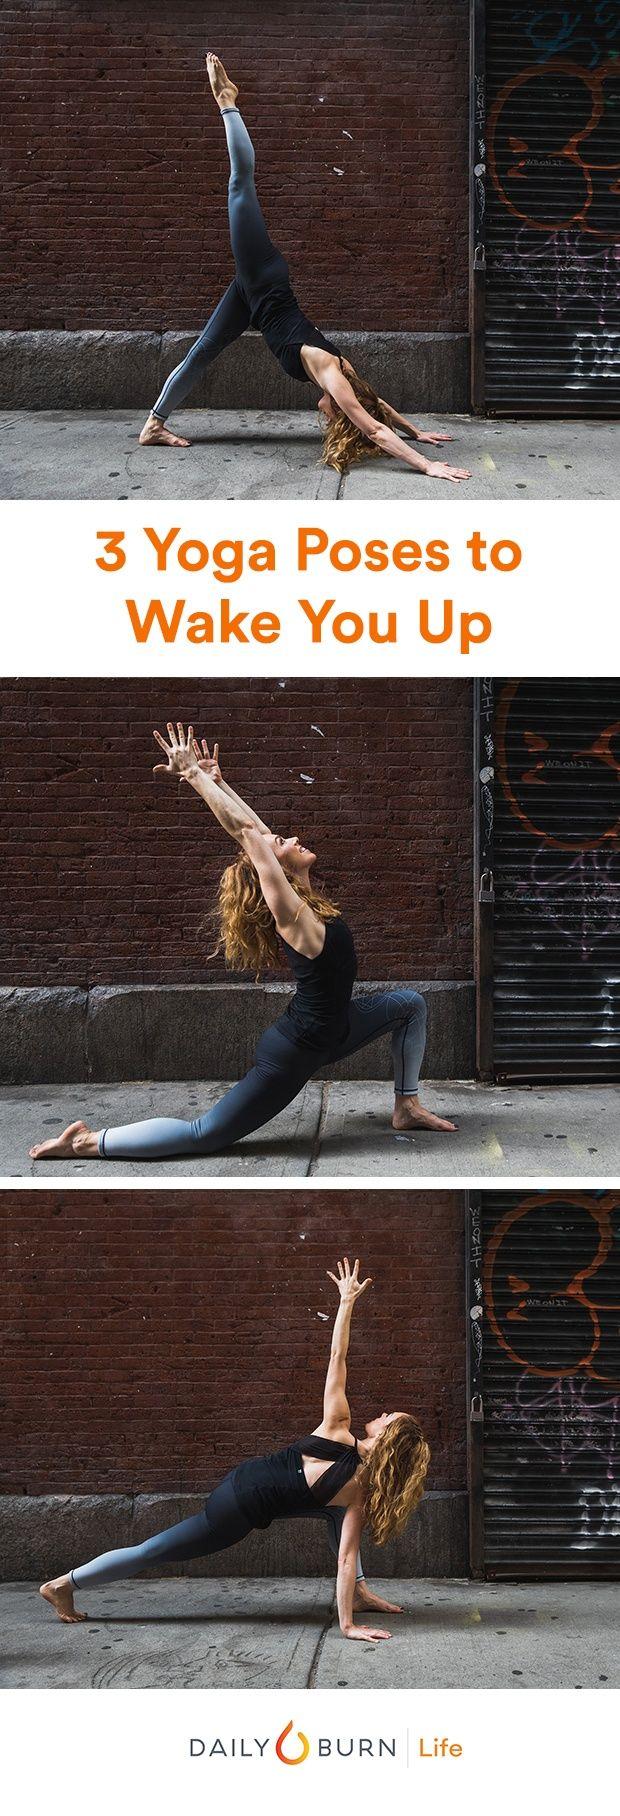 3 Easy Yoga Poses To Wake You Up Yoga Poses Advanced Advanced Yoga Easy Yoga Poses